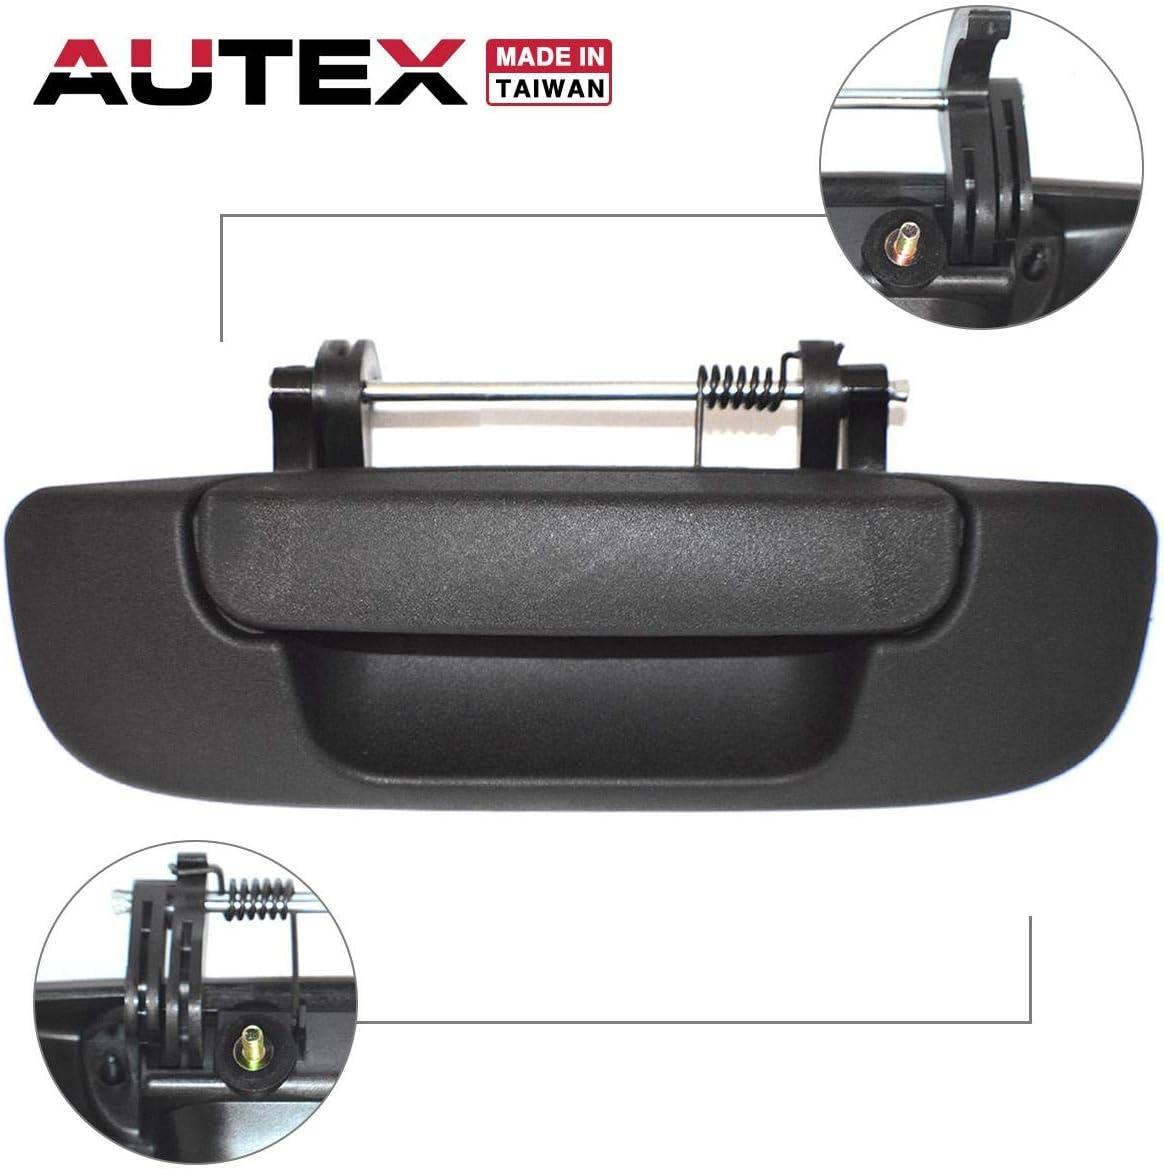 PL3400 Pop /& Lock Black Tailgate Handle Lock fits 02-09 Dodge Ram